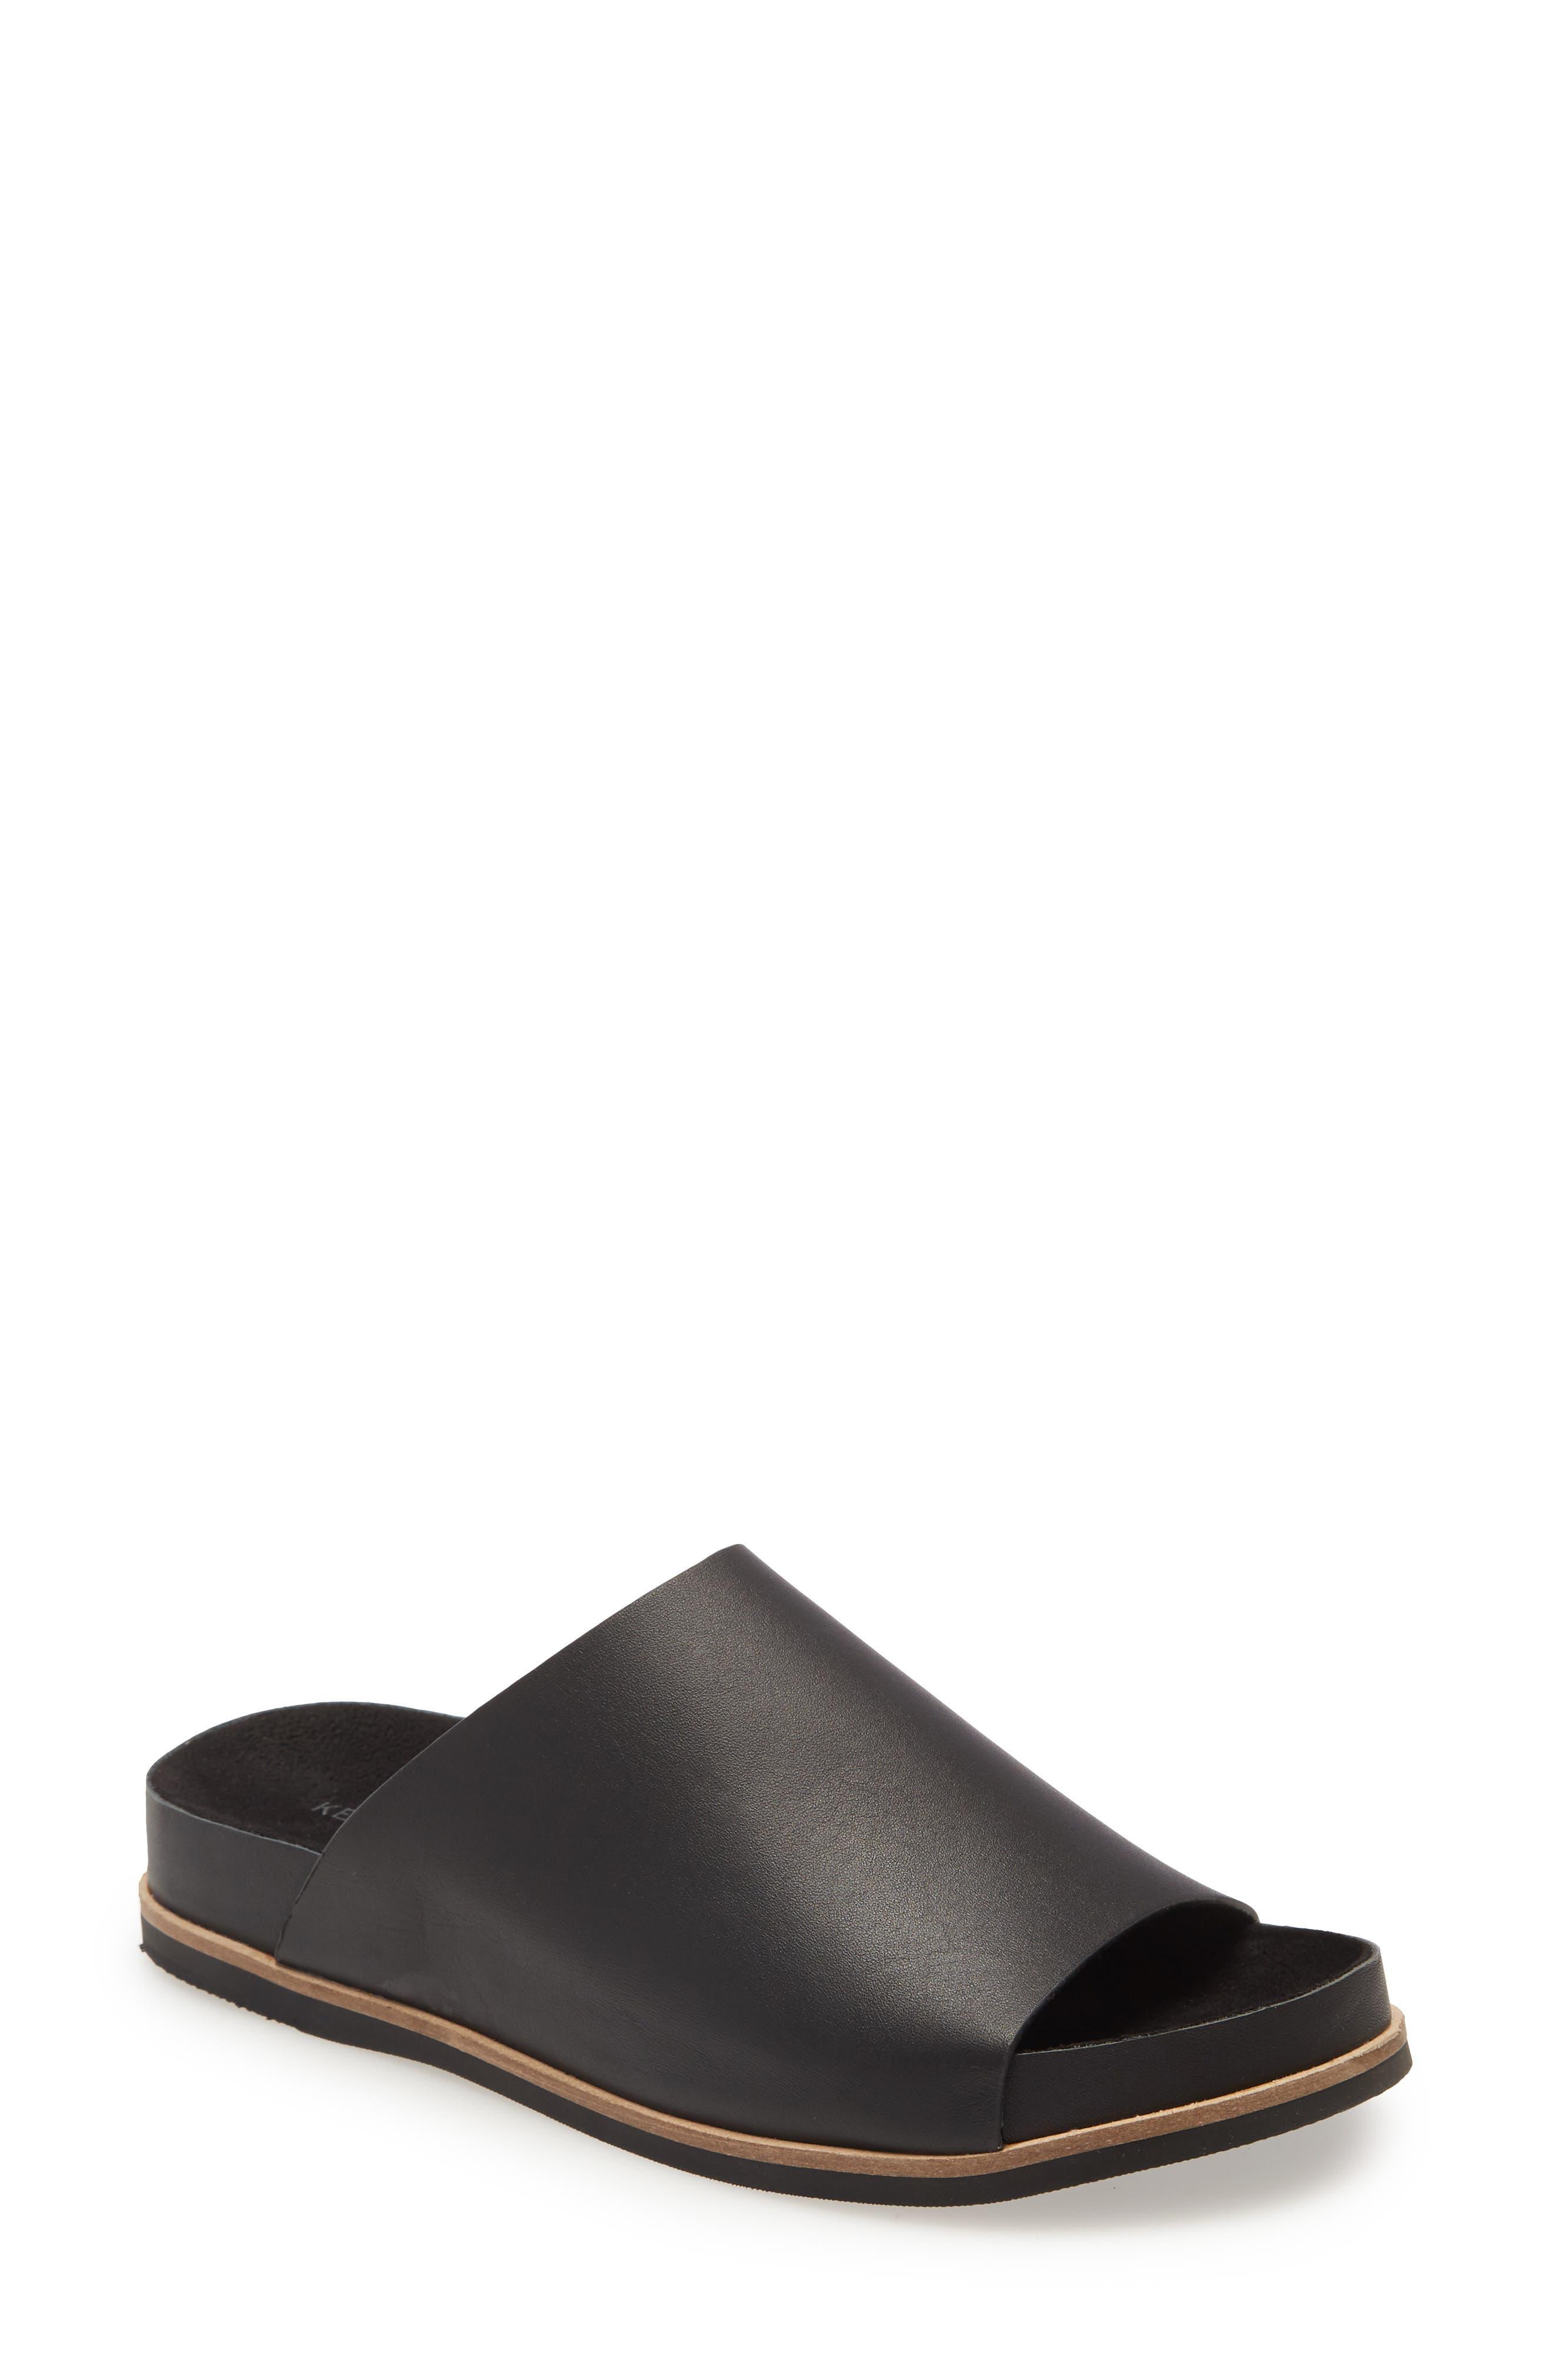 Squish Slide Sandal